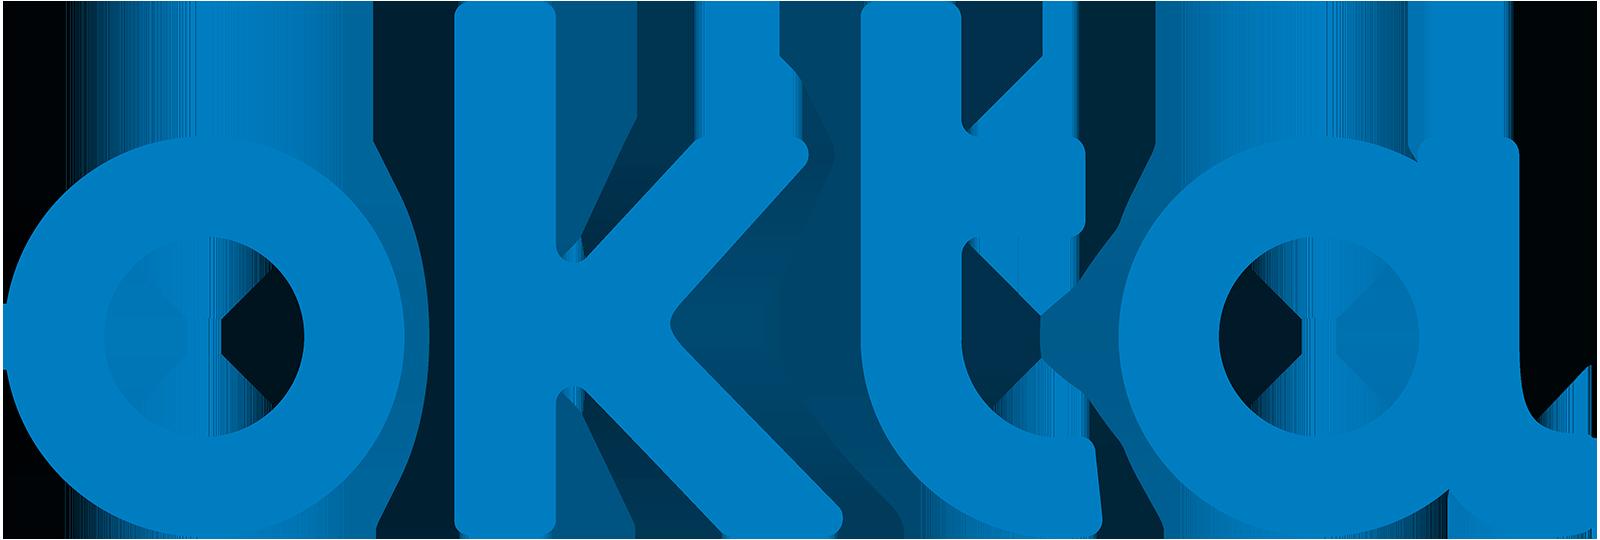 Okta_Logo_BrightBlue_Medium.png